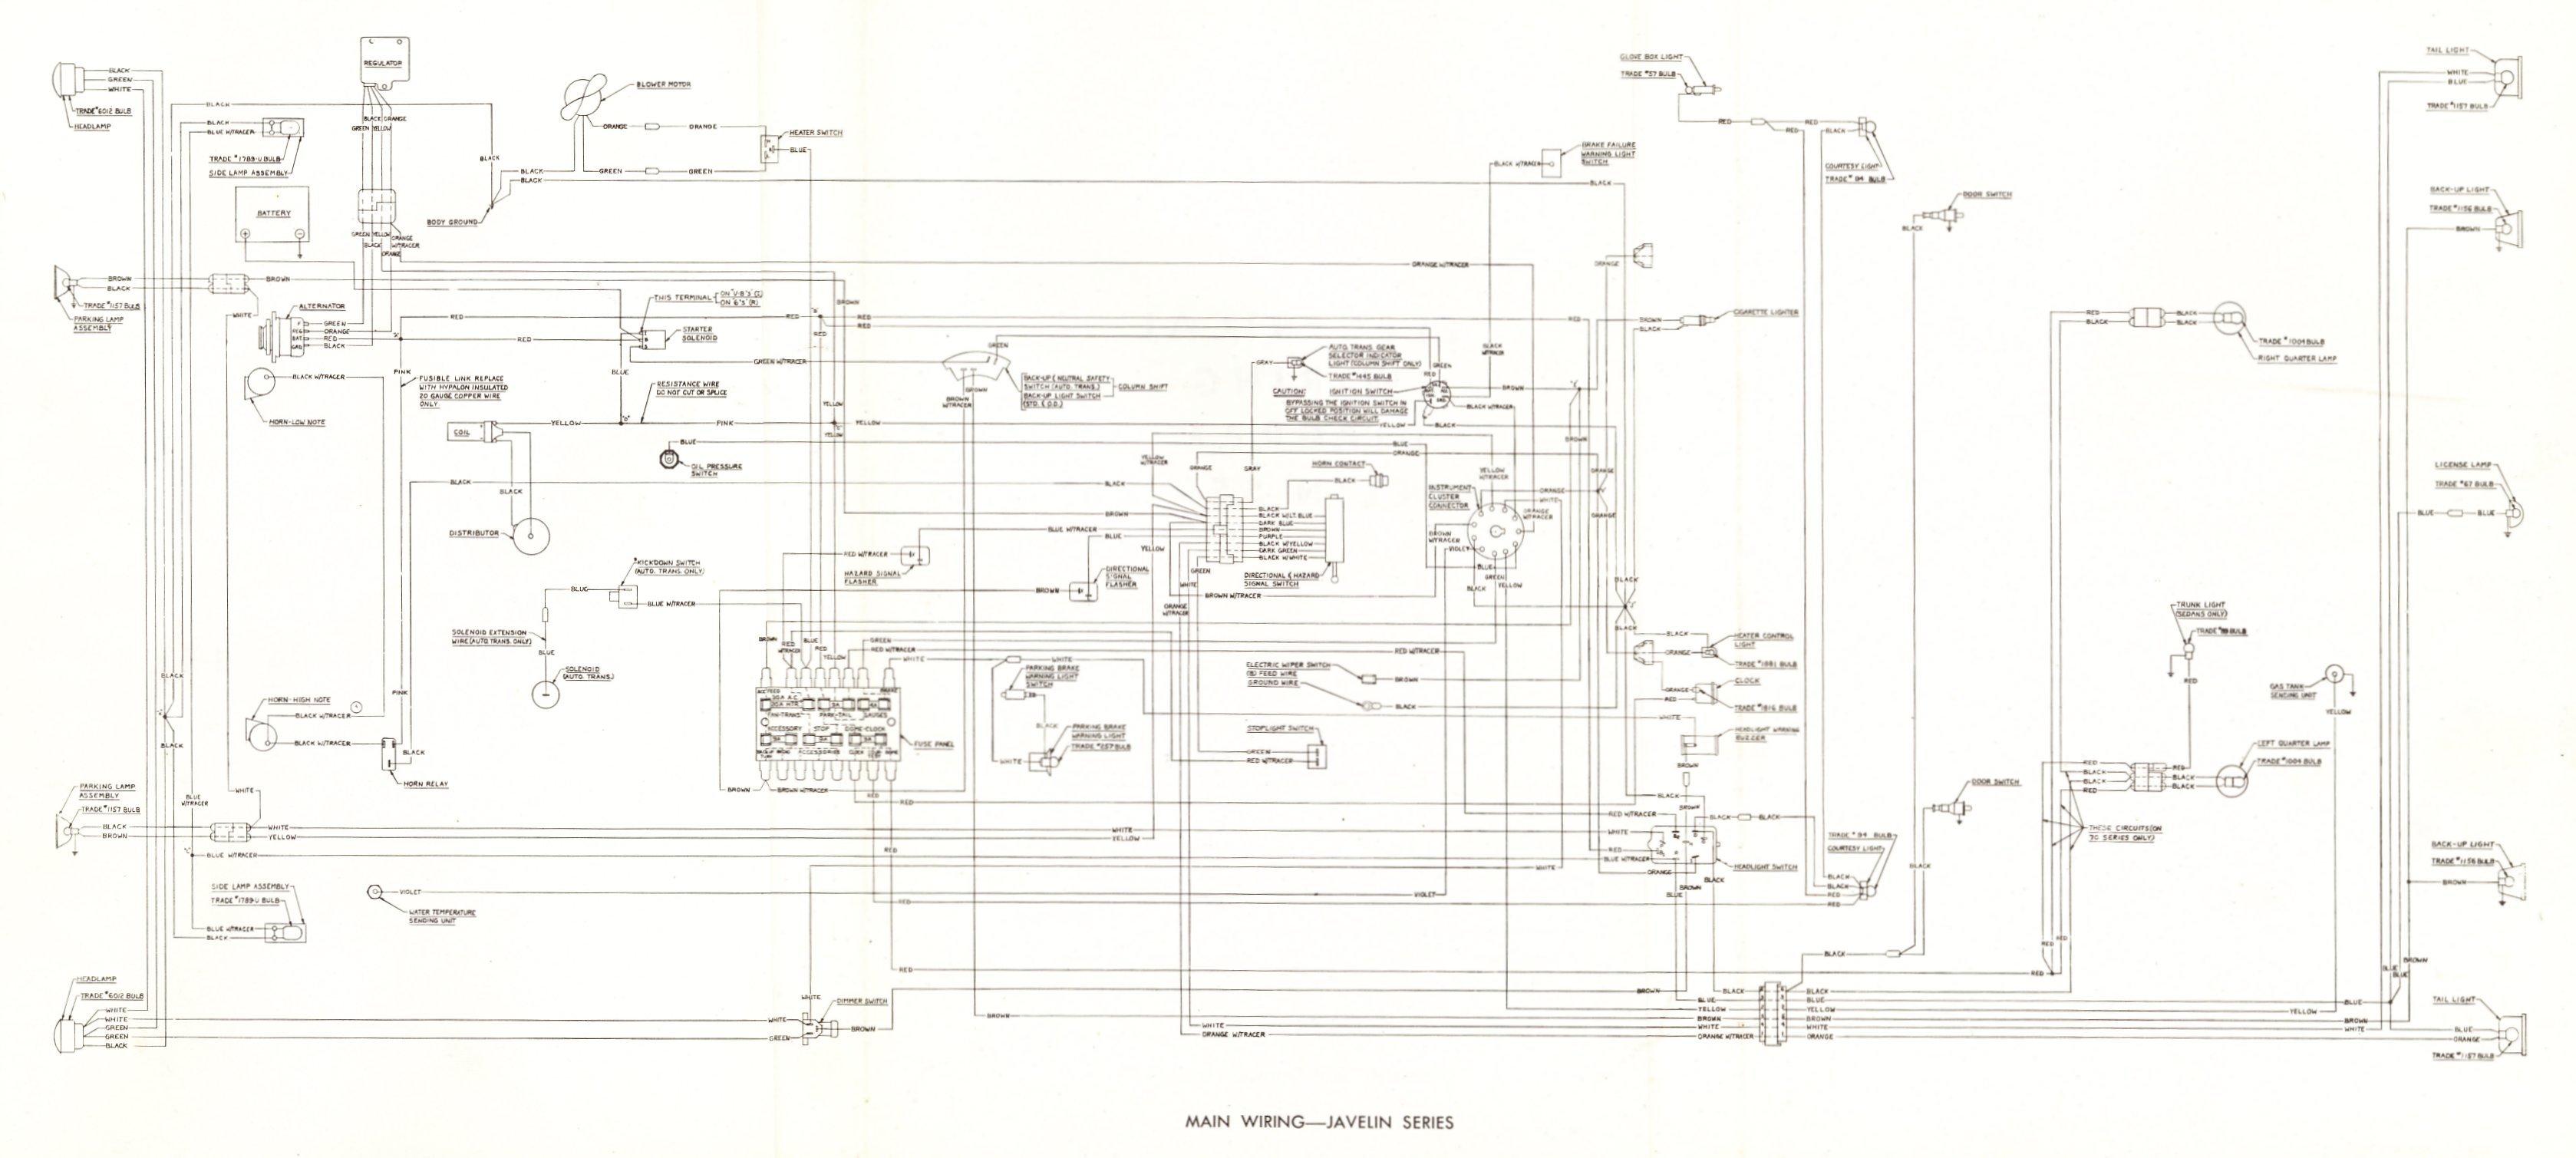 sn_8633] 1969 amc amx wiring diagram wiring diagram amx wiring diagram  funi indi zidur olyti embo ungo momece mohammedshrine librar ...